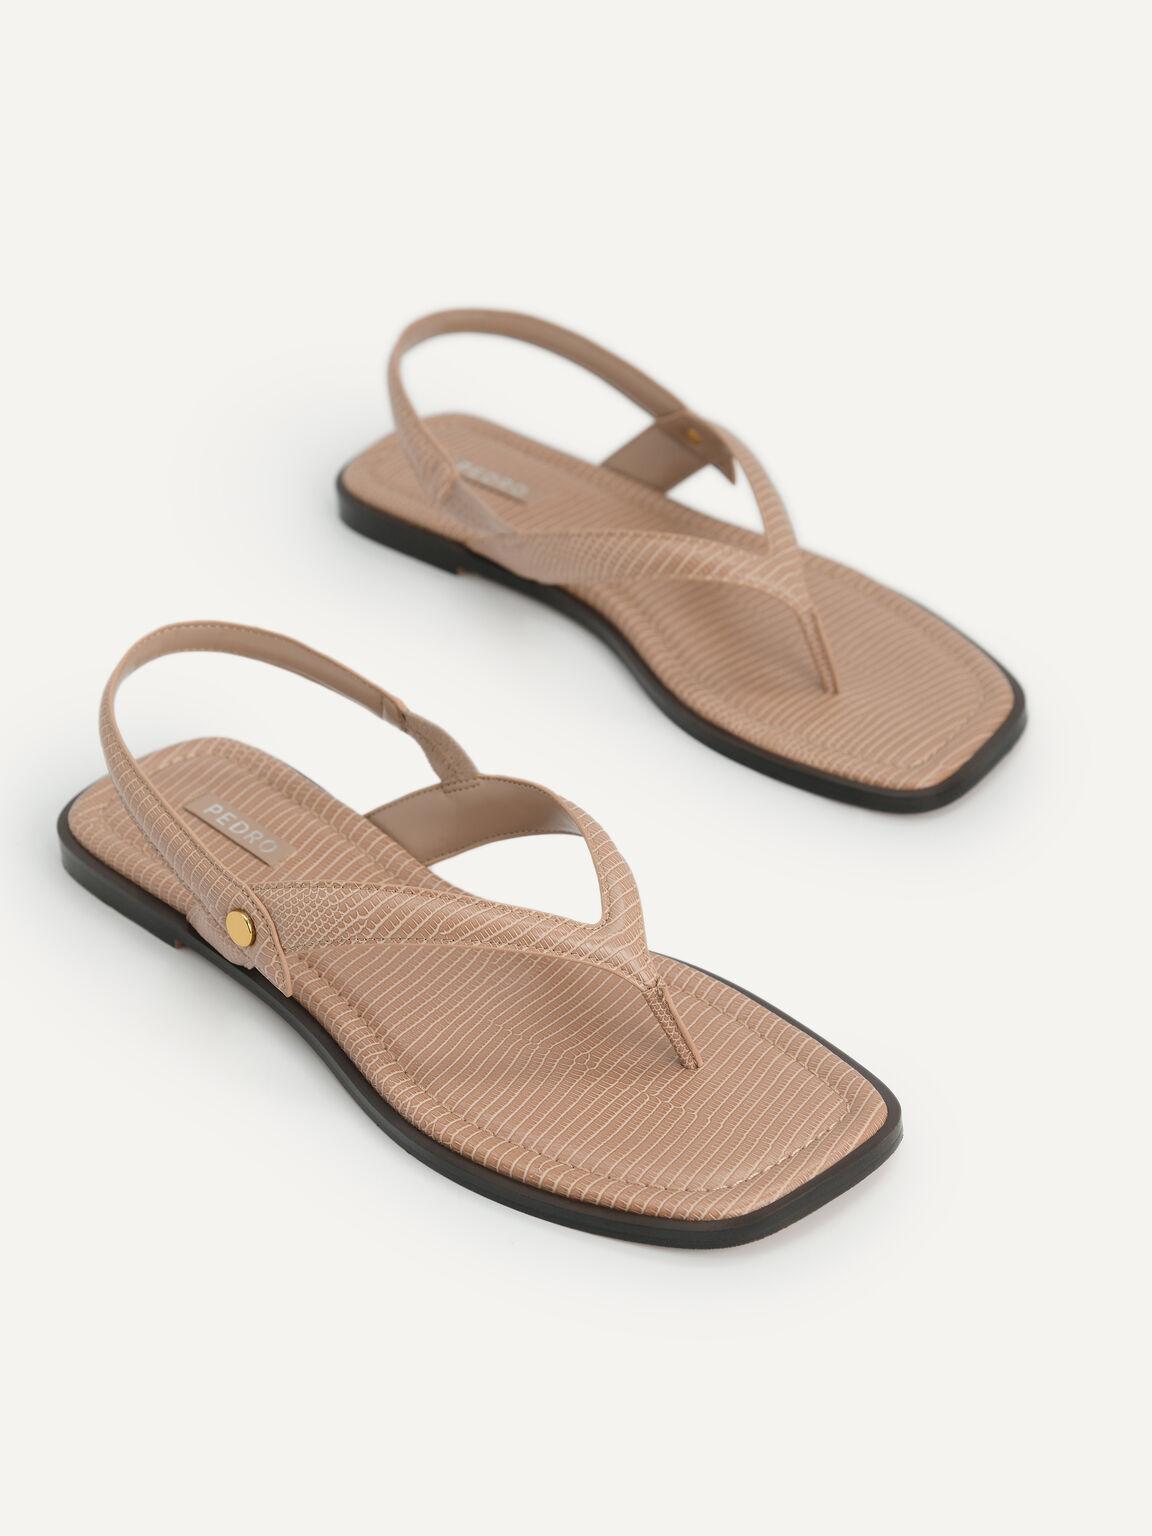 Lizard-Effect Slingback Thong Sandals, Taupe, hi-res